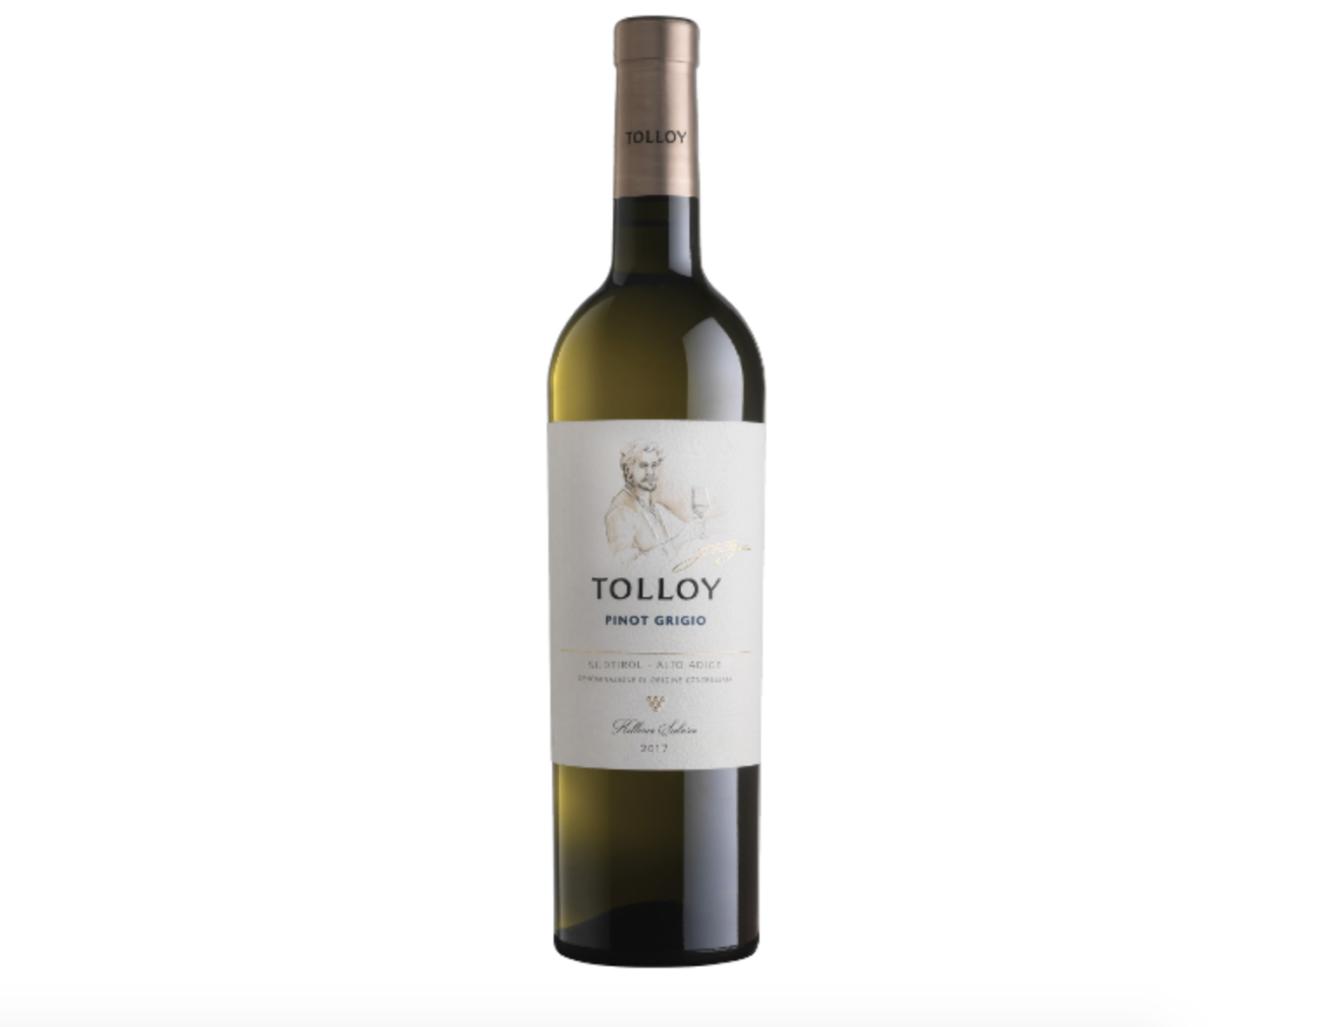 Pinot Grigio Alto Adige DOC Tolloy Mezzacorona